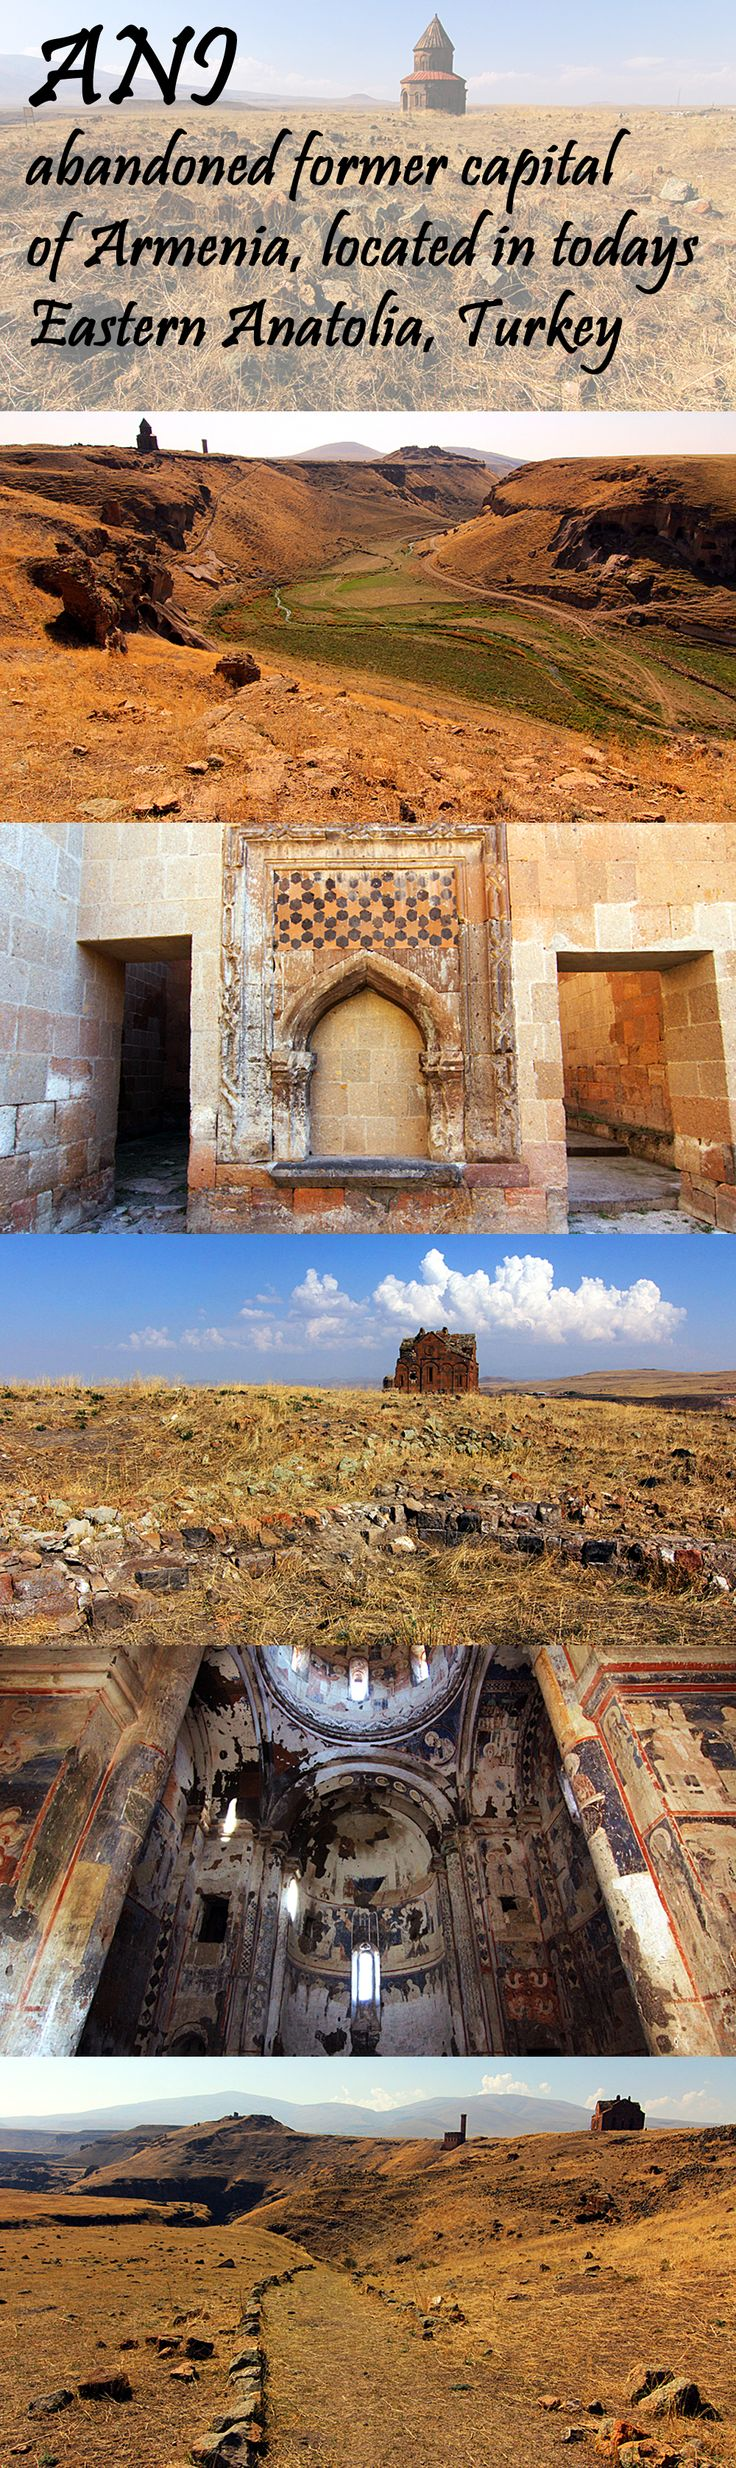 Strange and unusual sights in Armenia